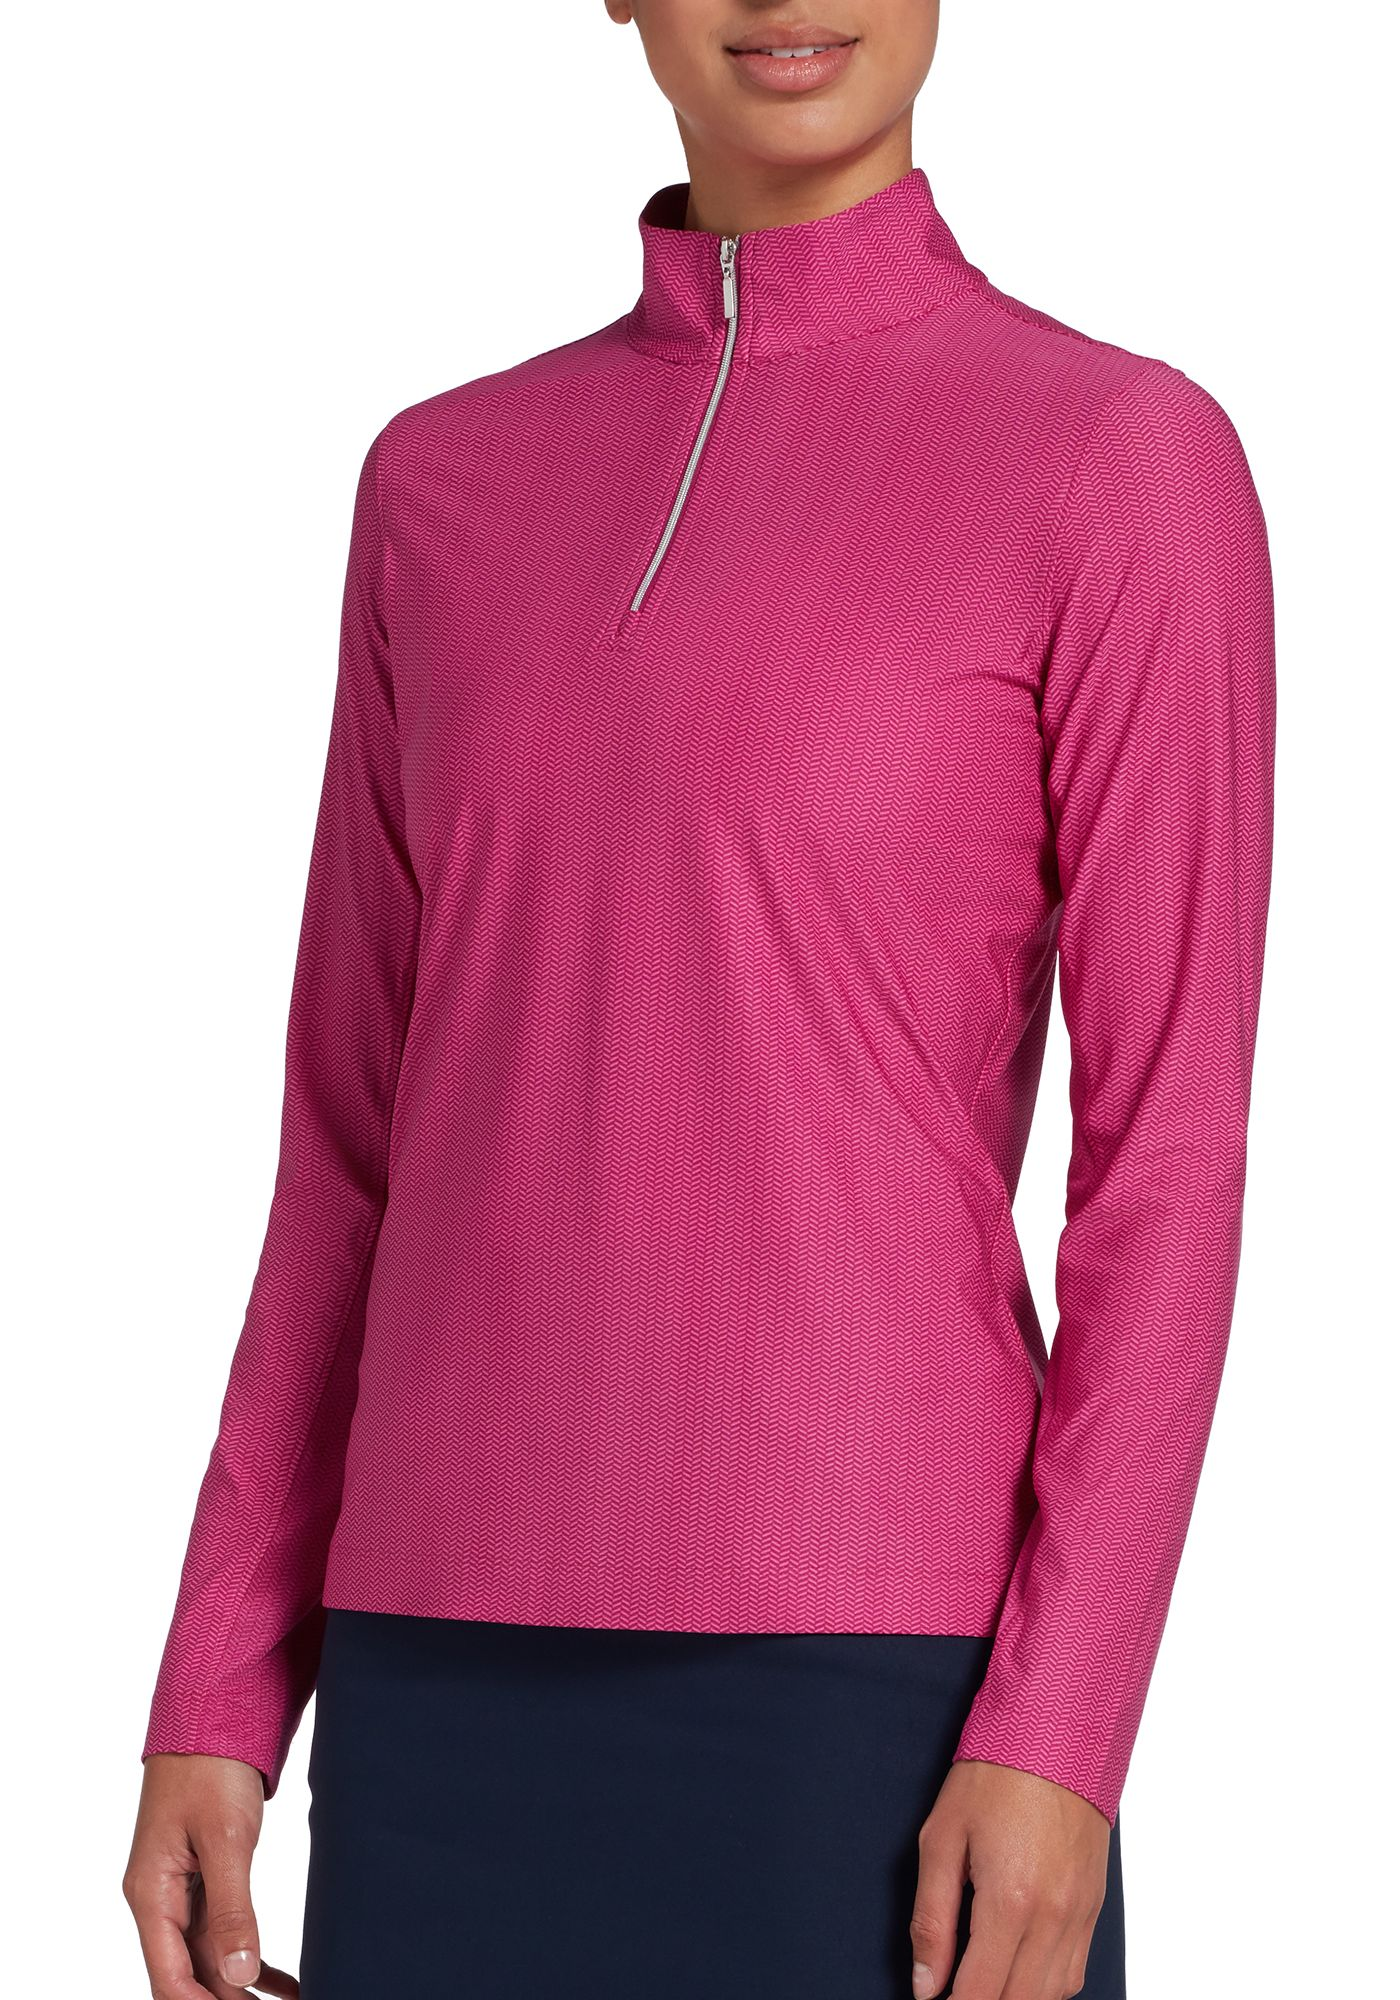 Lady Hagen Women's Printed UV ¼-Zip Golf Pullover